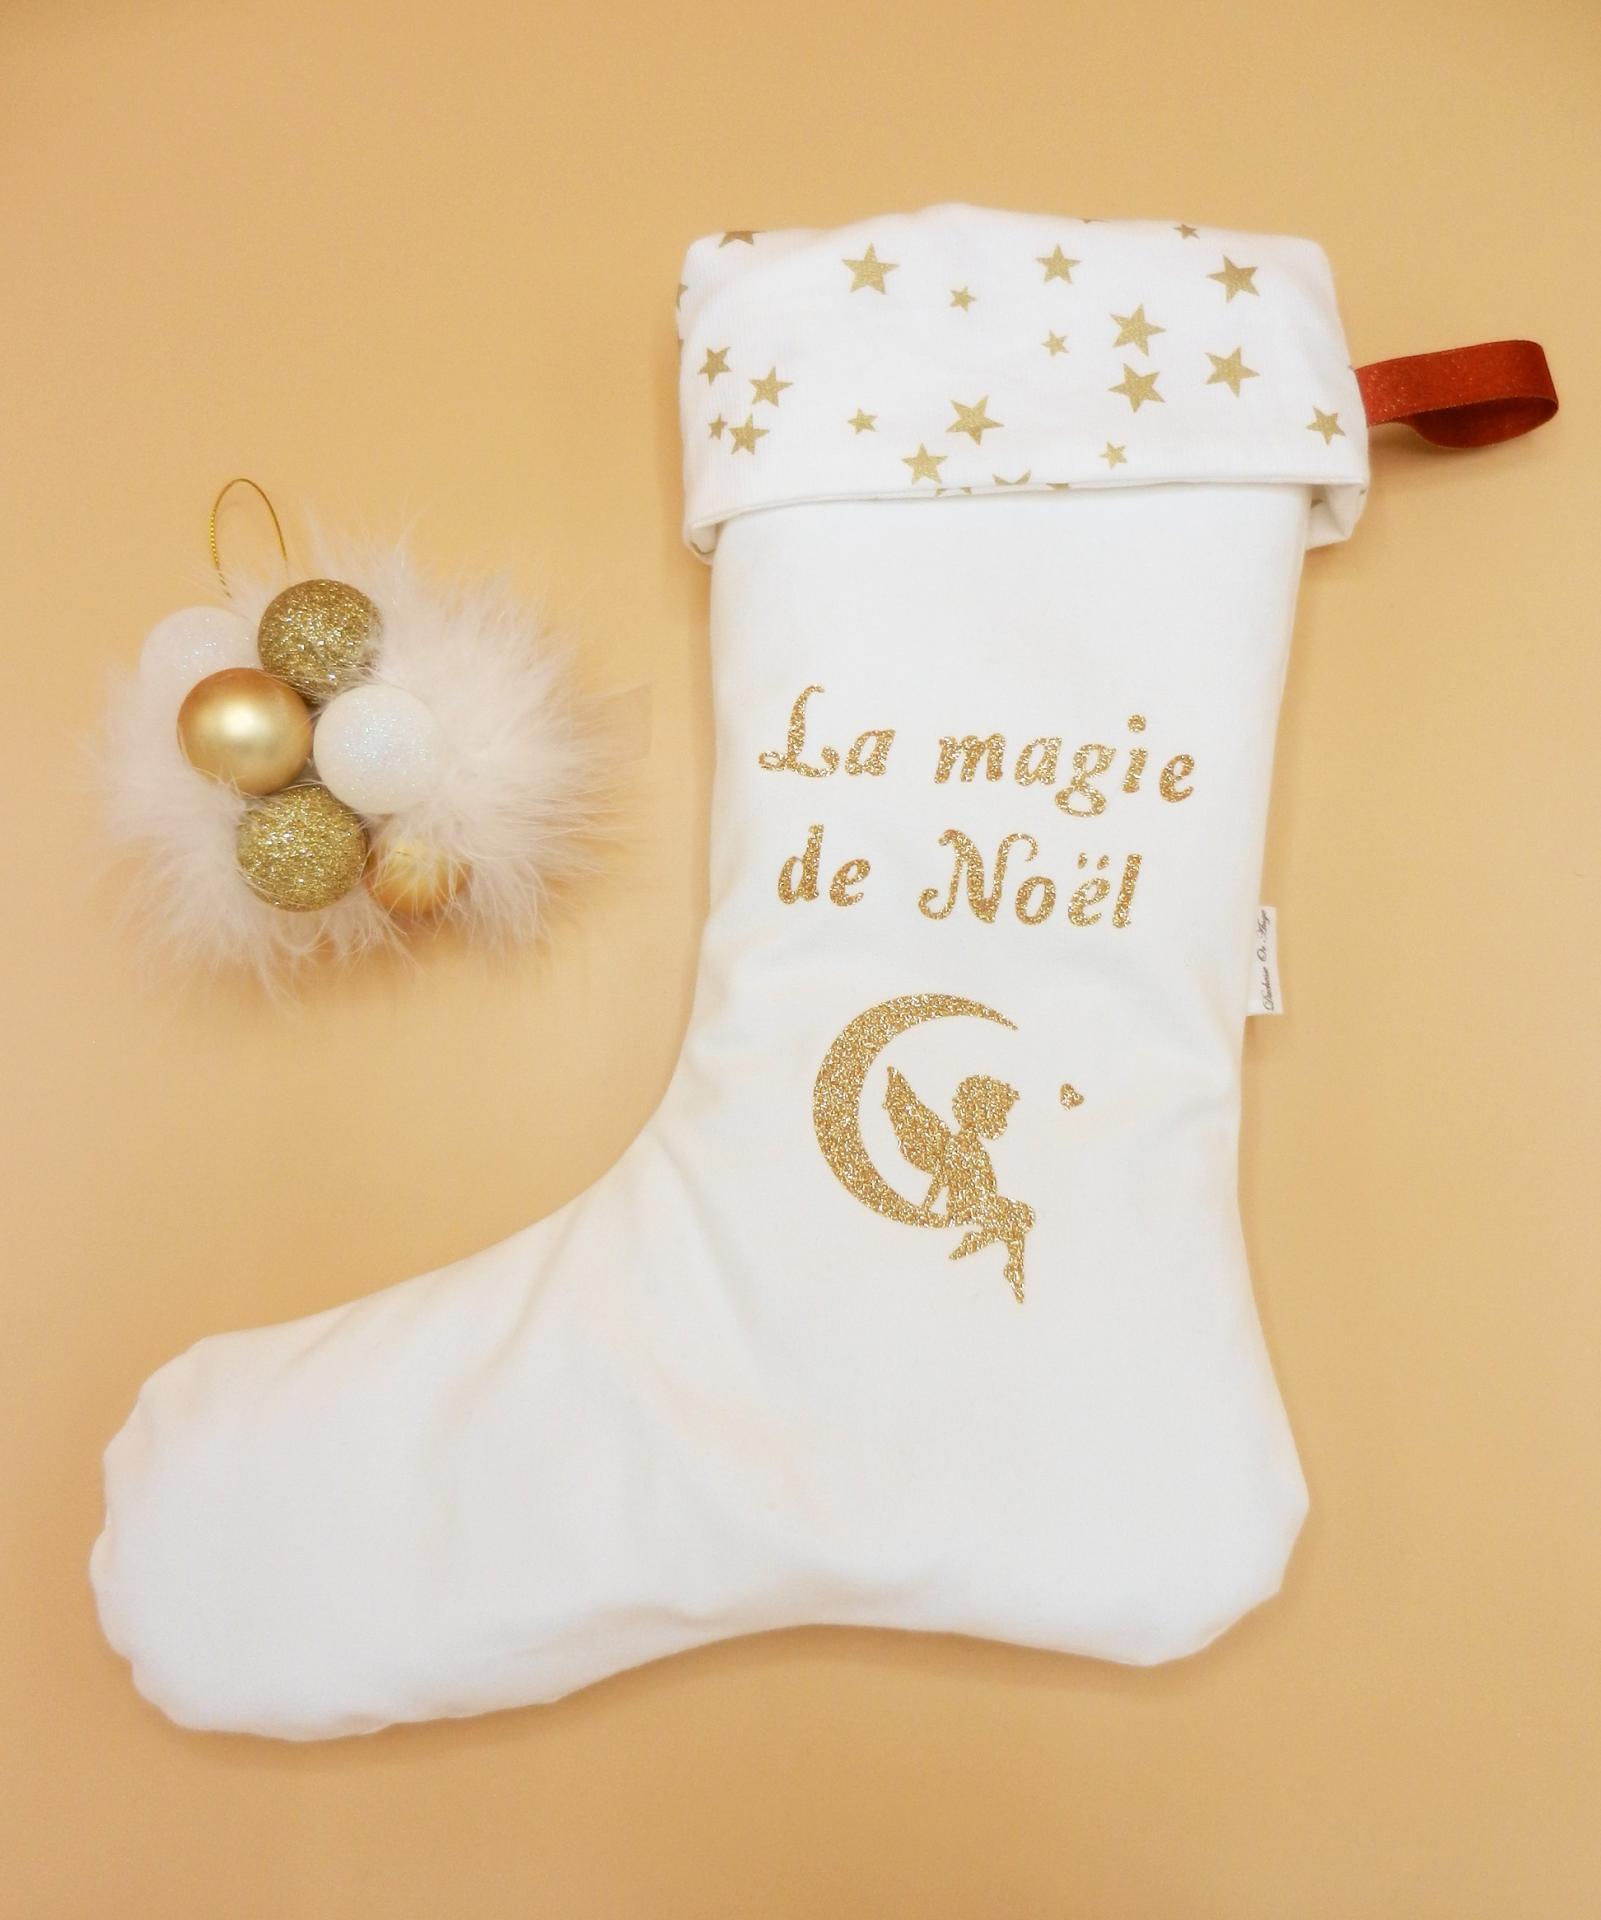 Duchesse or ange doaa 82 botte de noel blanche etoiles dorees prenom texte a